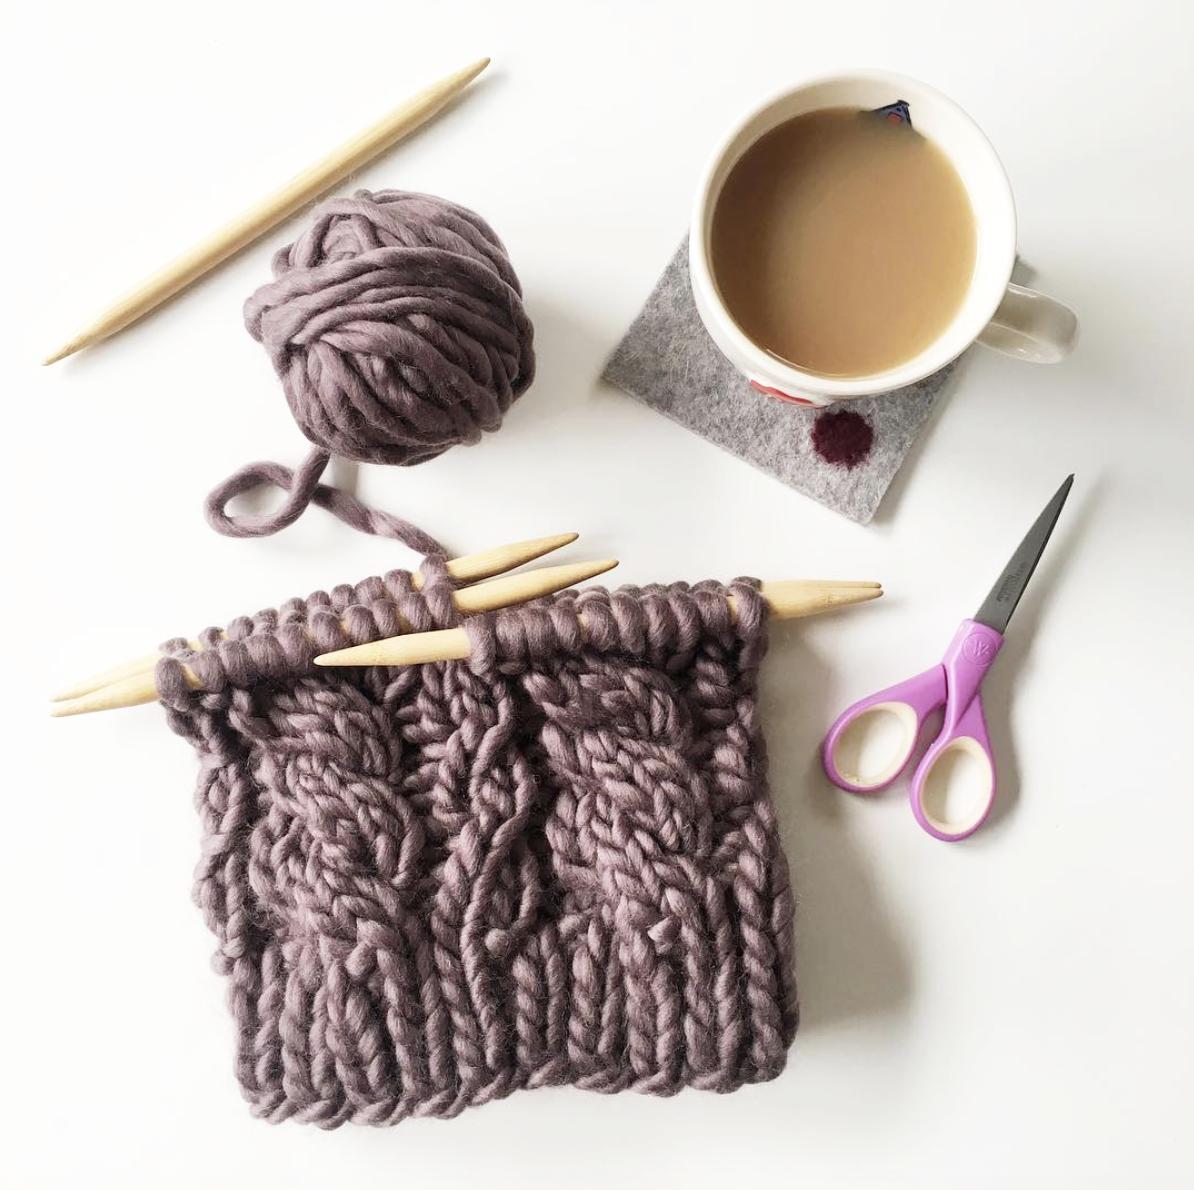 elisemade-purple-chunky-cable-knitting-winter-hat-yarn-tea-diy